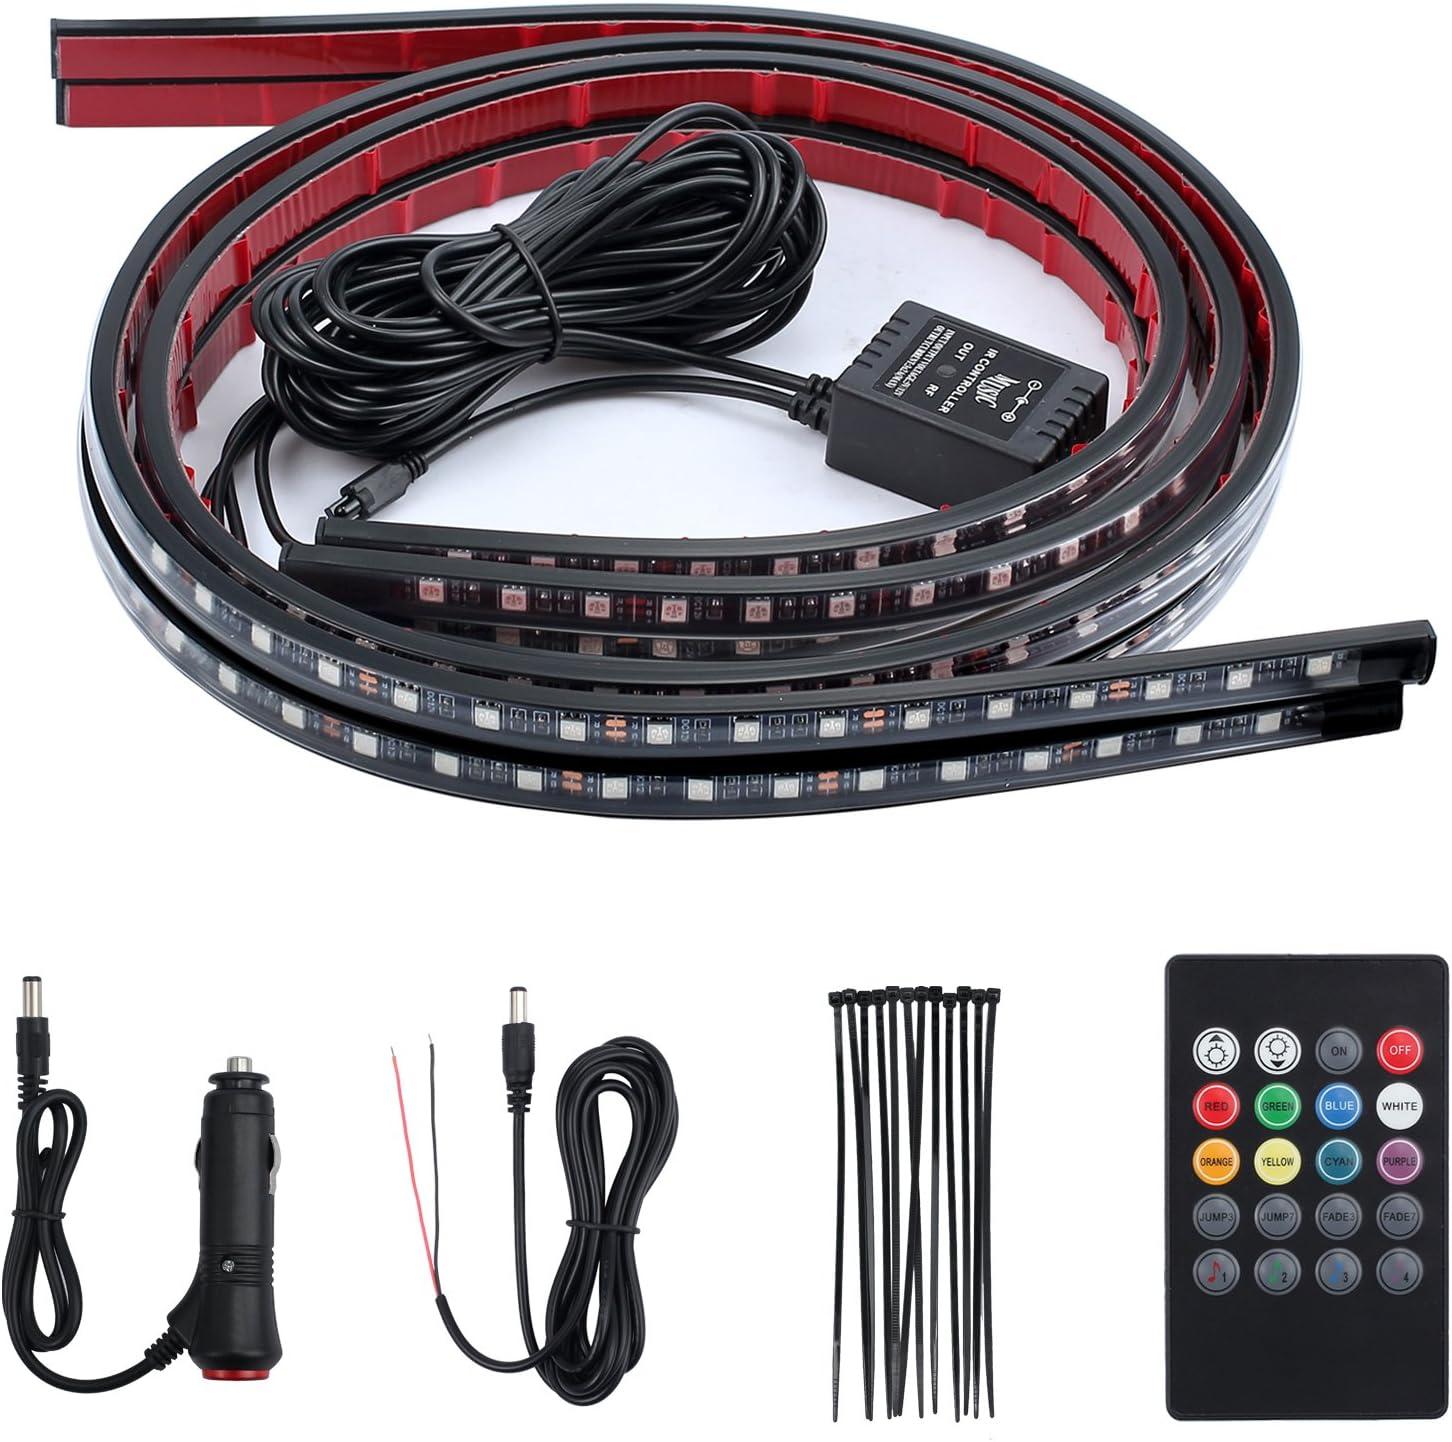 Underbody Lighting Kit 12V RGB LED Neon Strip Lights Wireless Remote,5050 SMD Multi Color Atmosphere Light Sound Active Justech Car Underglow Lights